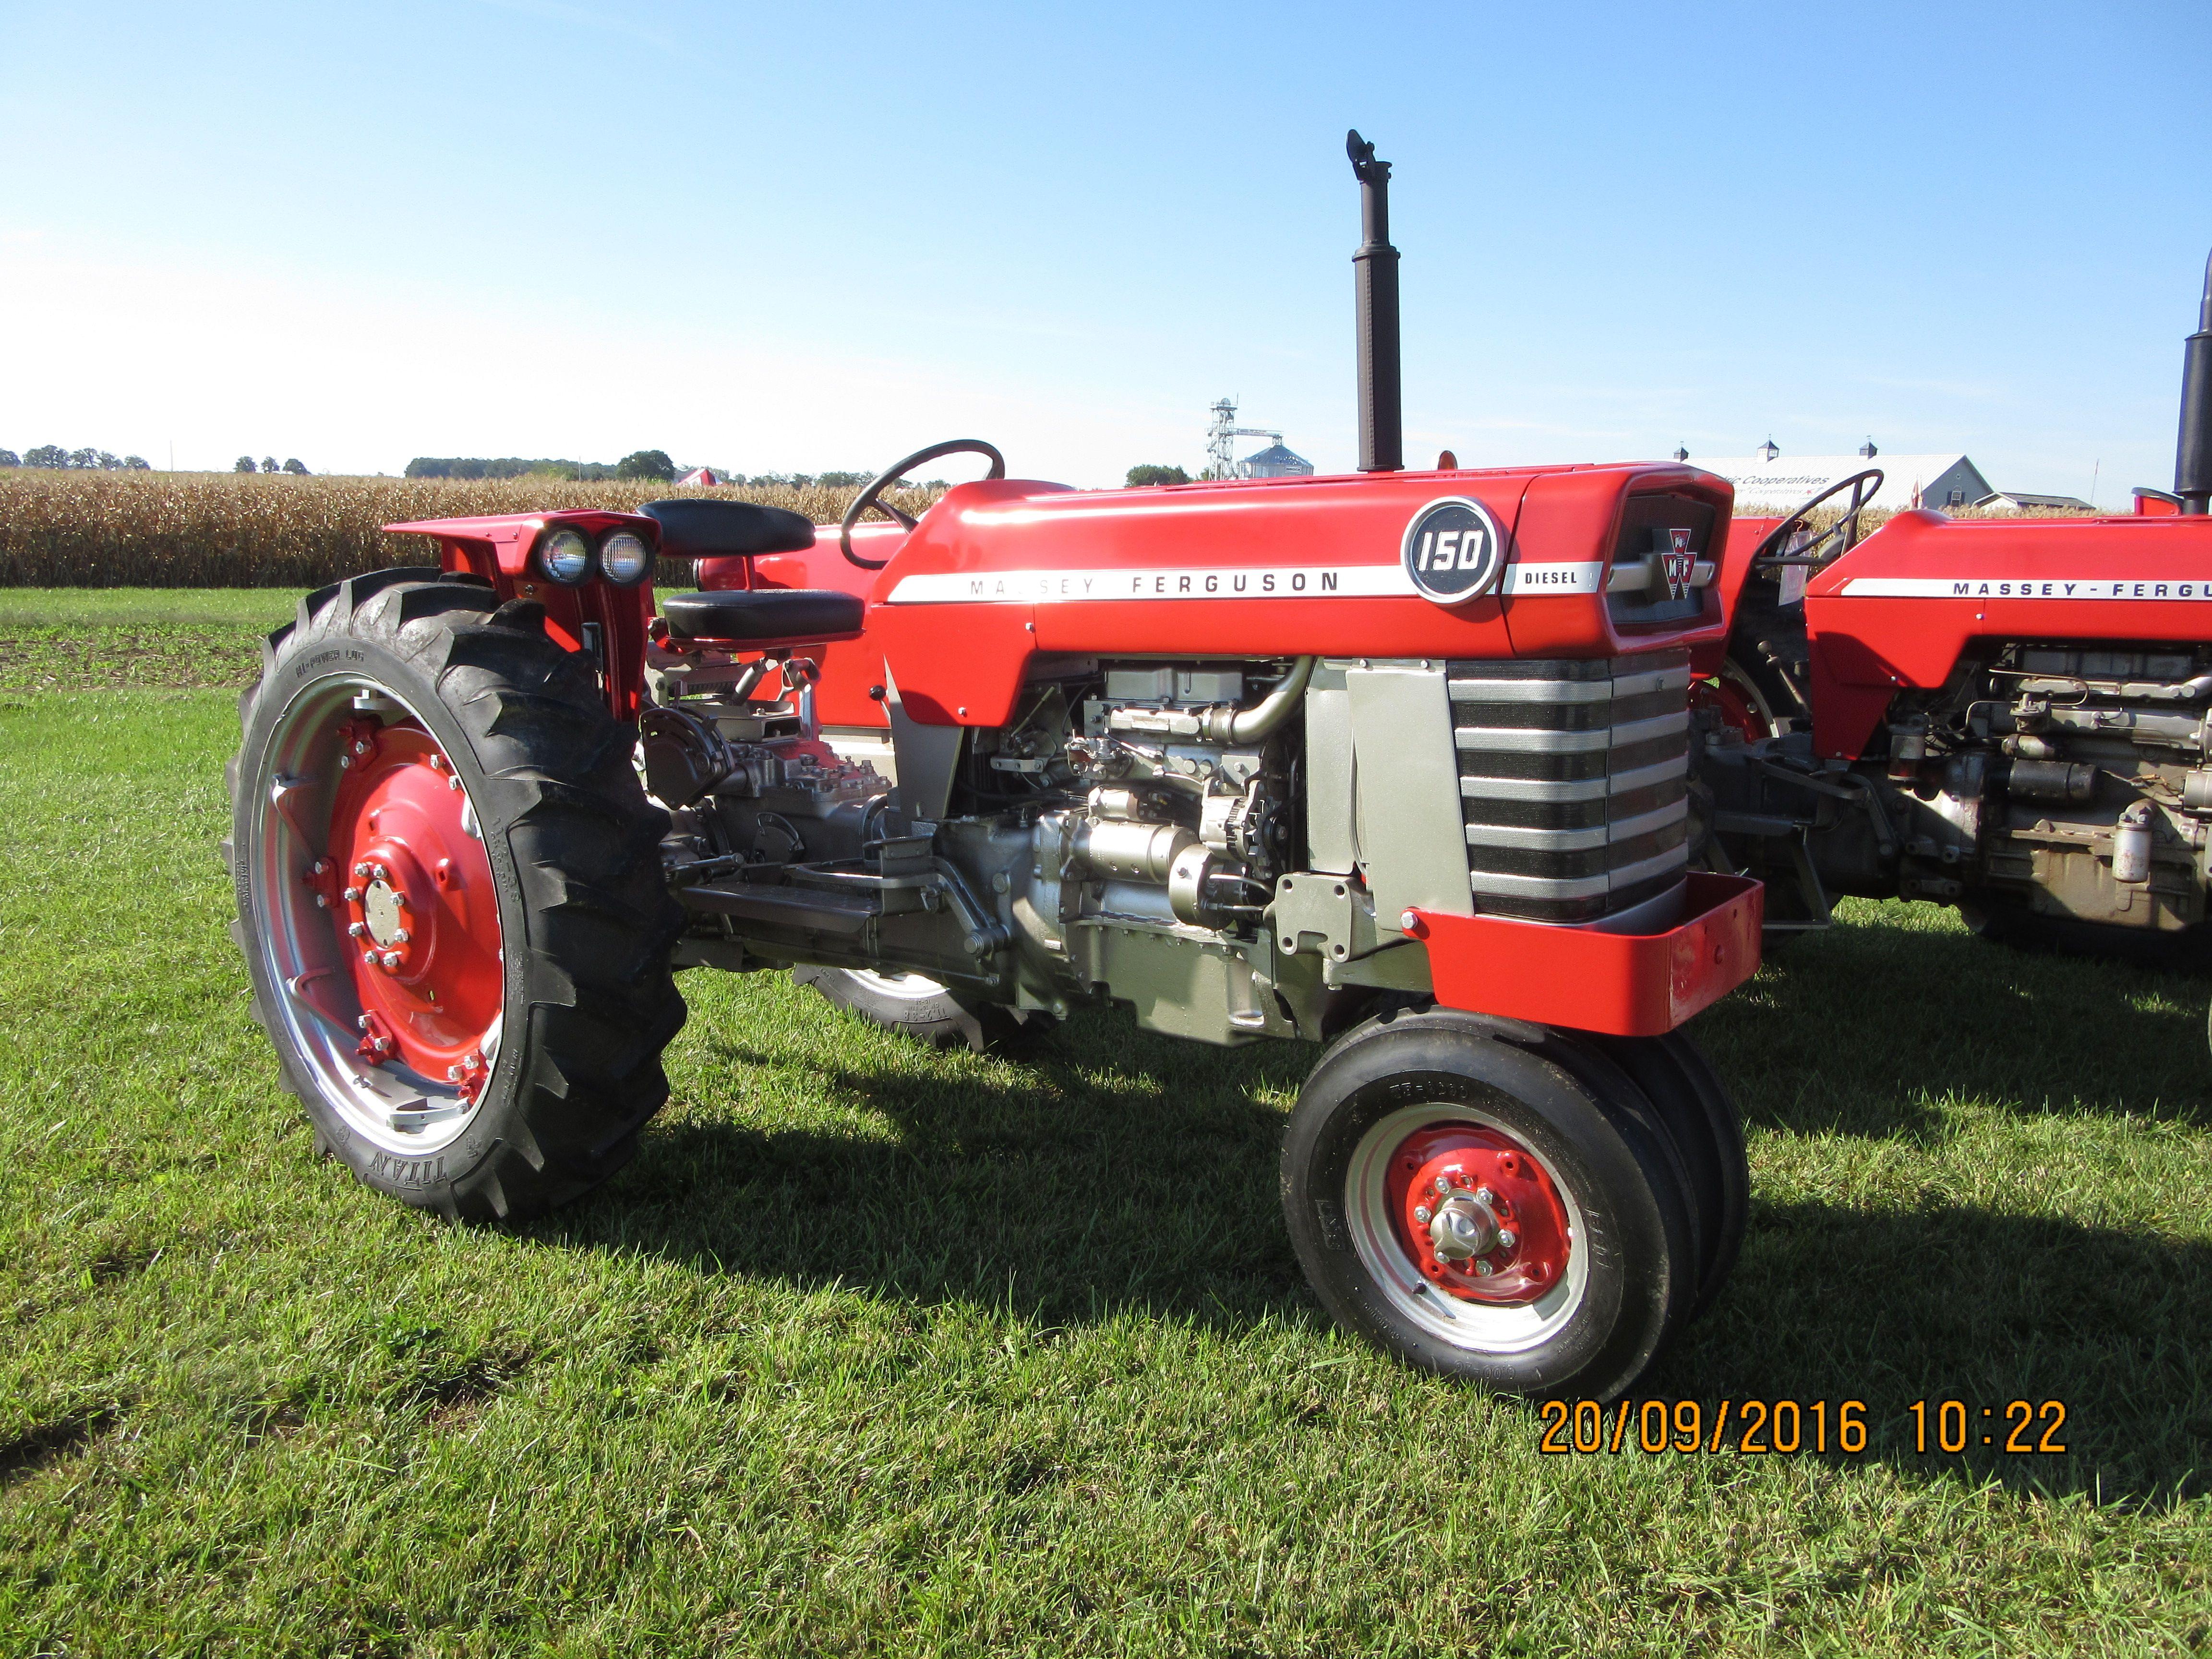 Massey Ferguson 150 Tractors, Tractor Pulling